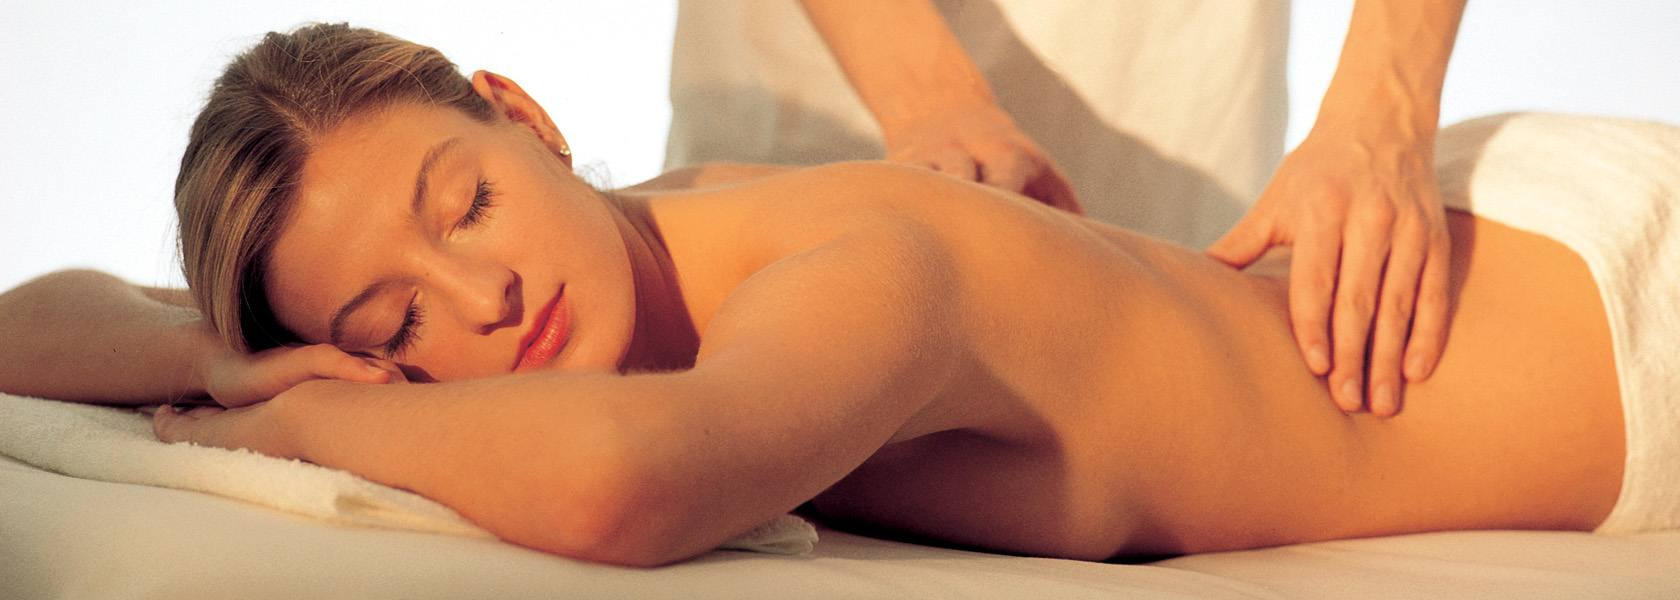 Thalasso-Massage, © Dirk Topel